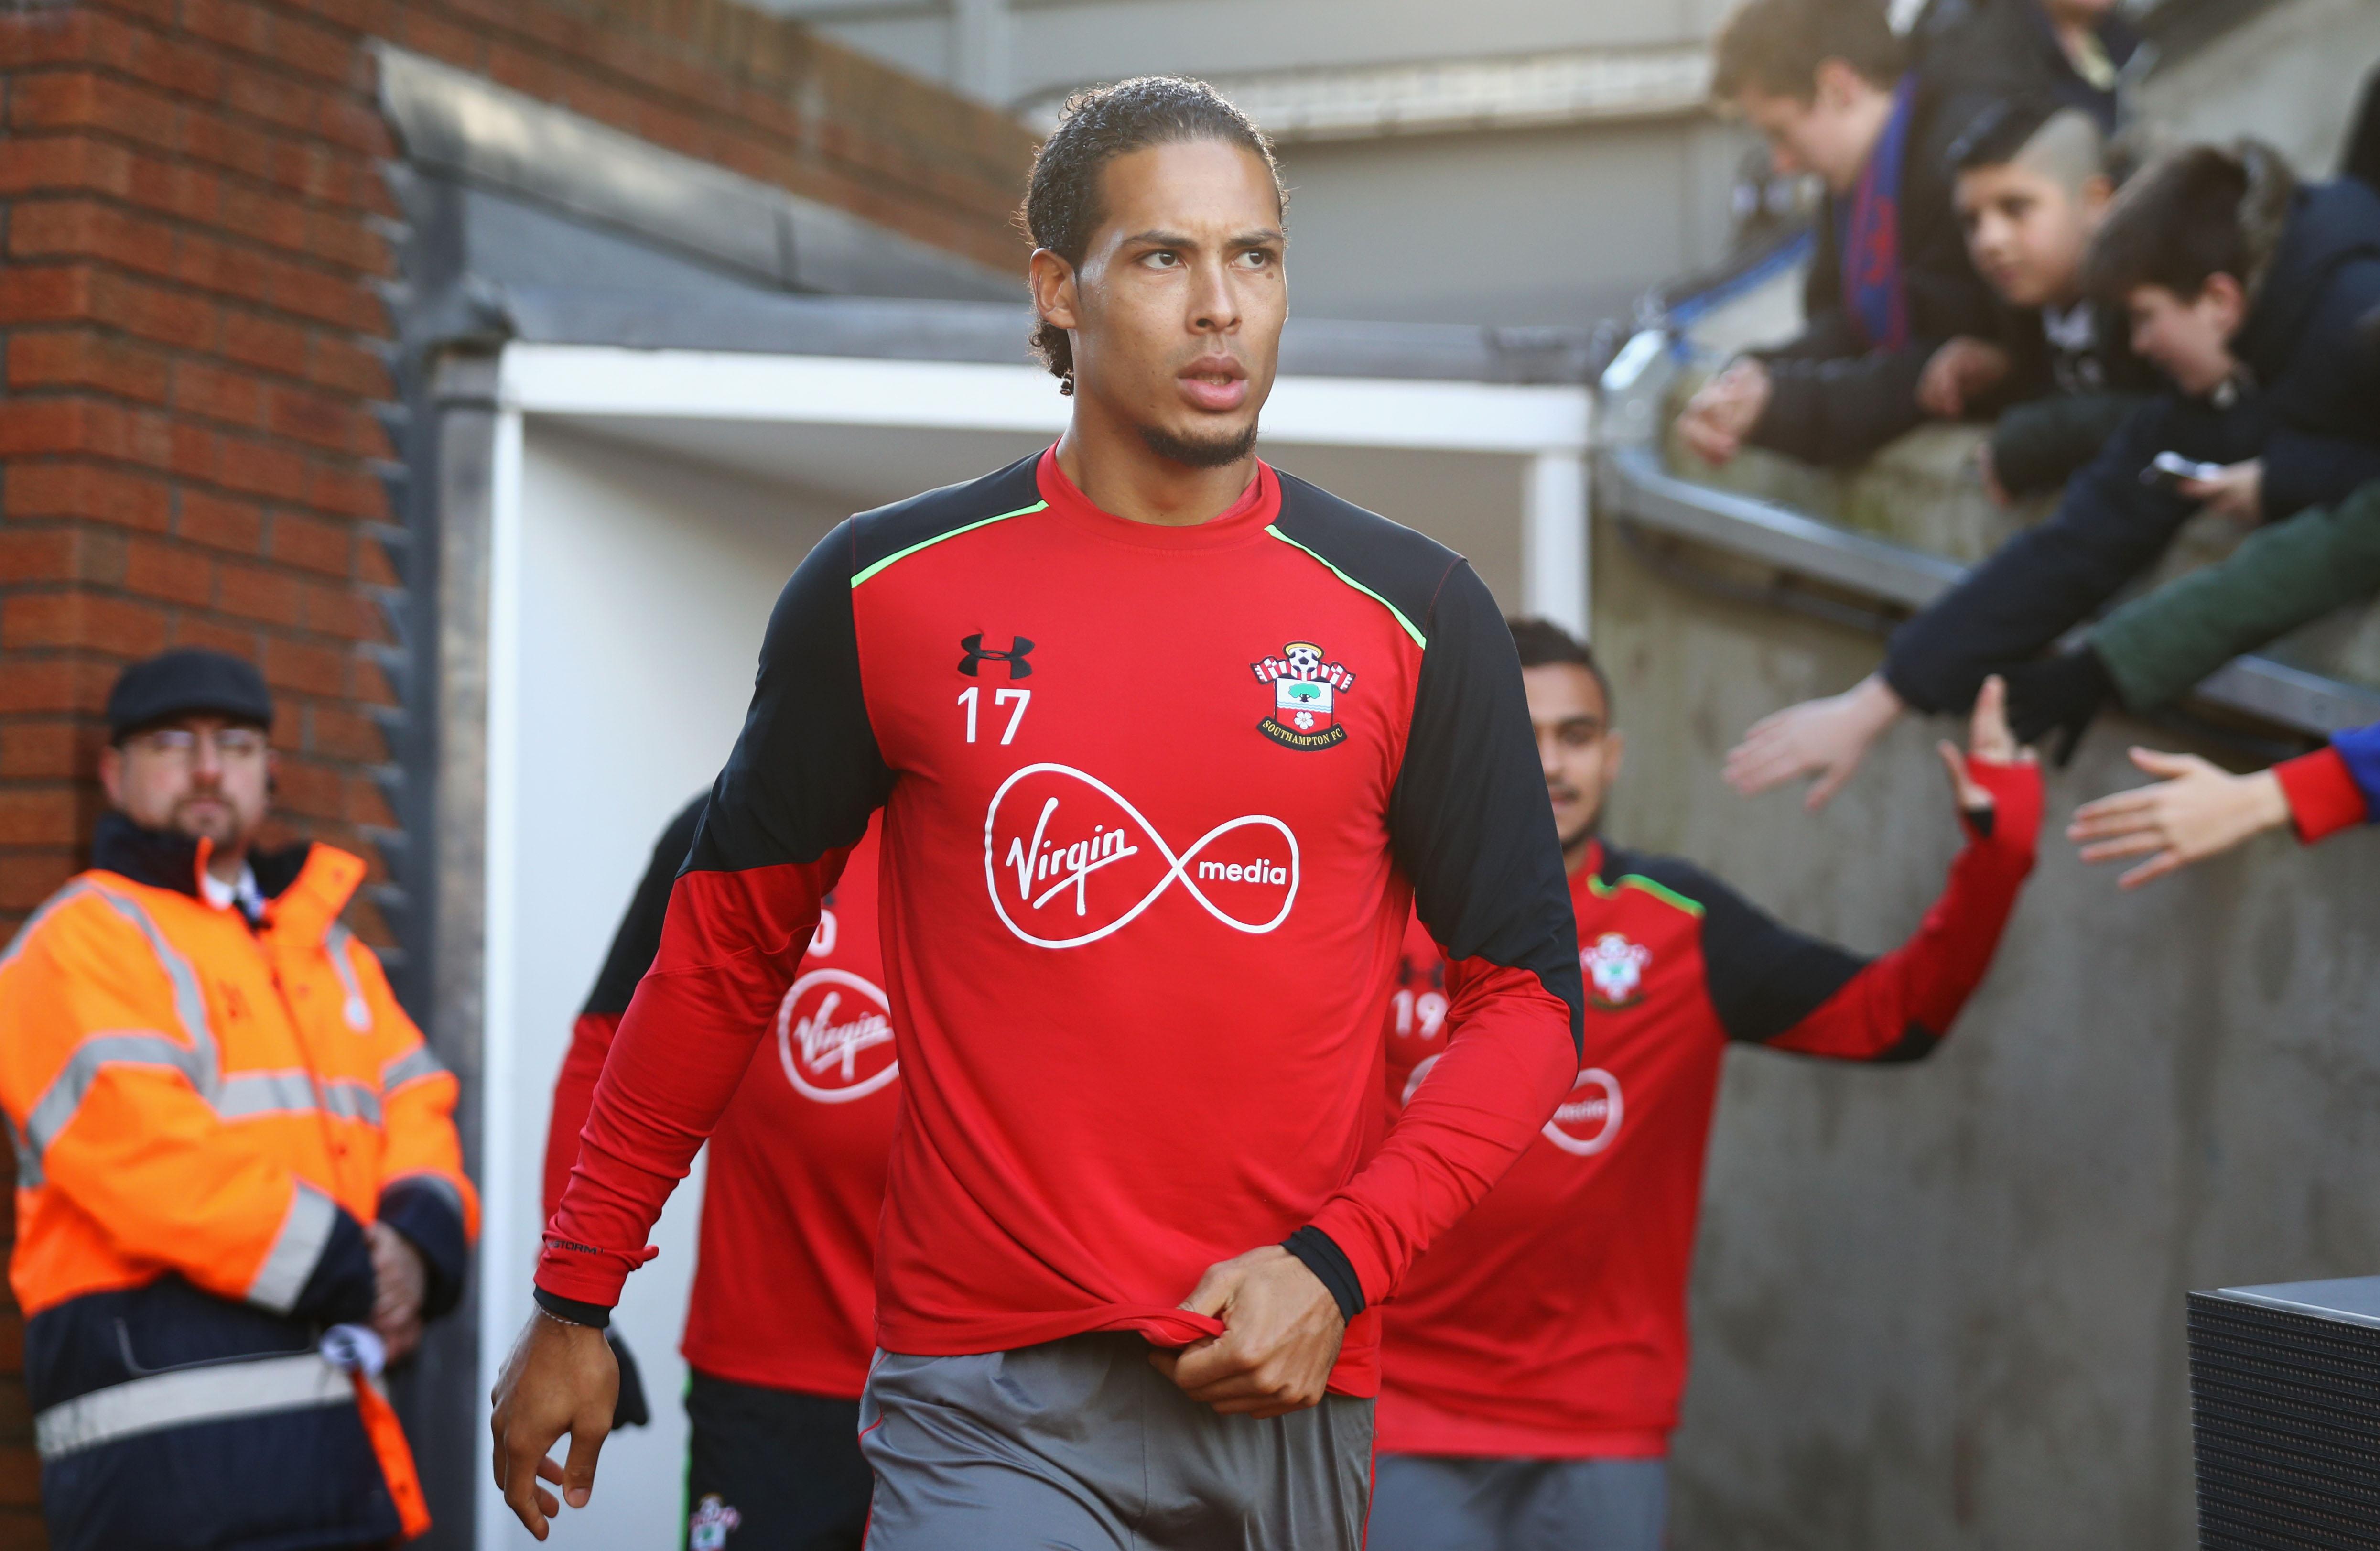 Liverpool and Chelsea yet to make official bids for Virgil van Dijk